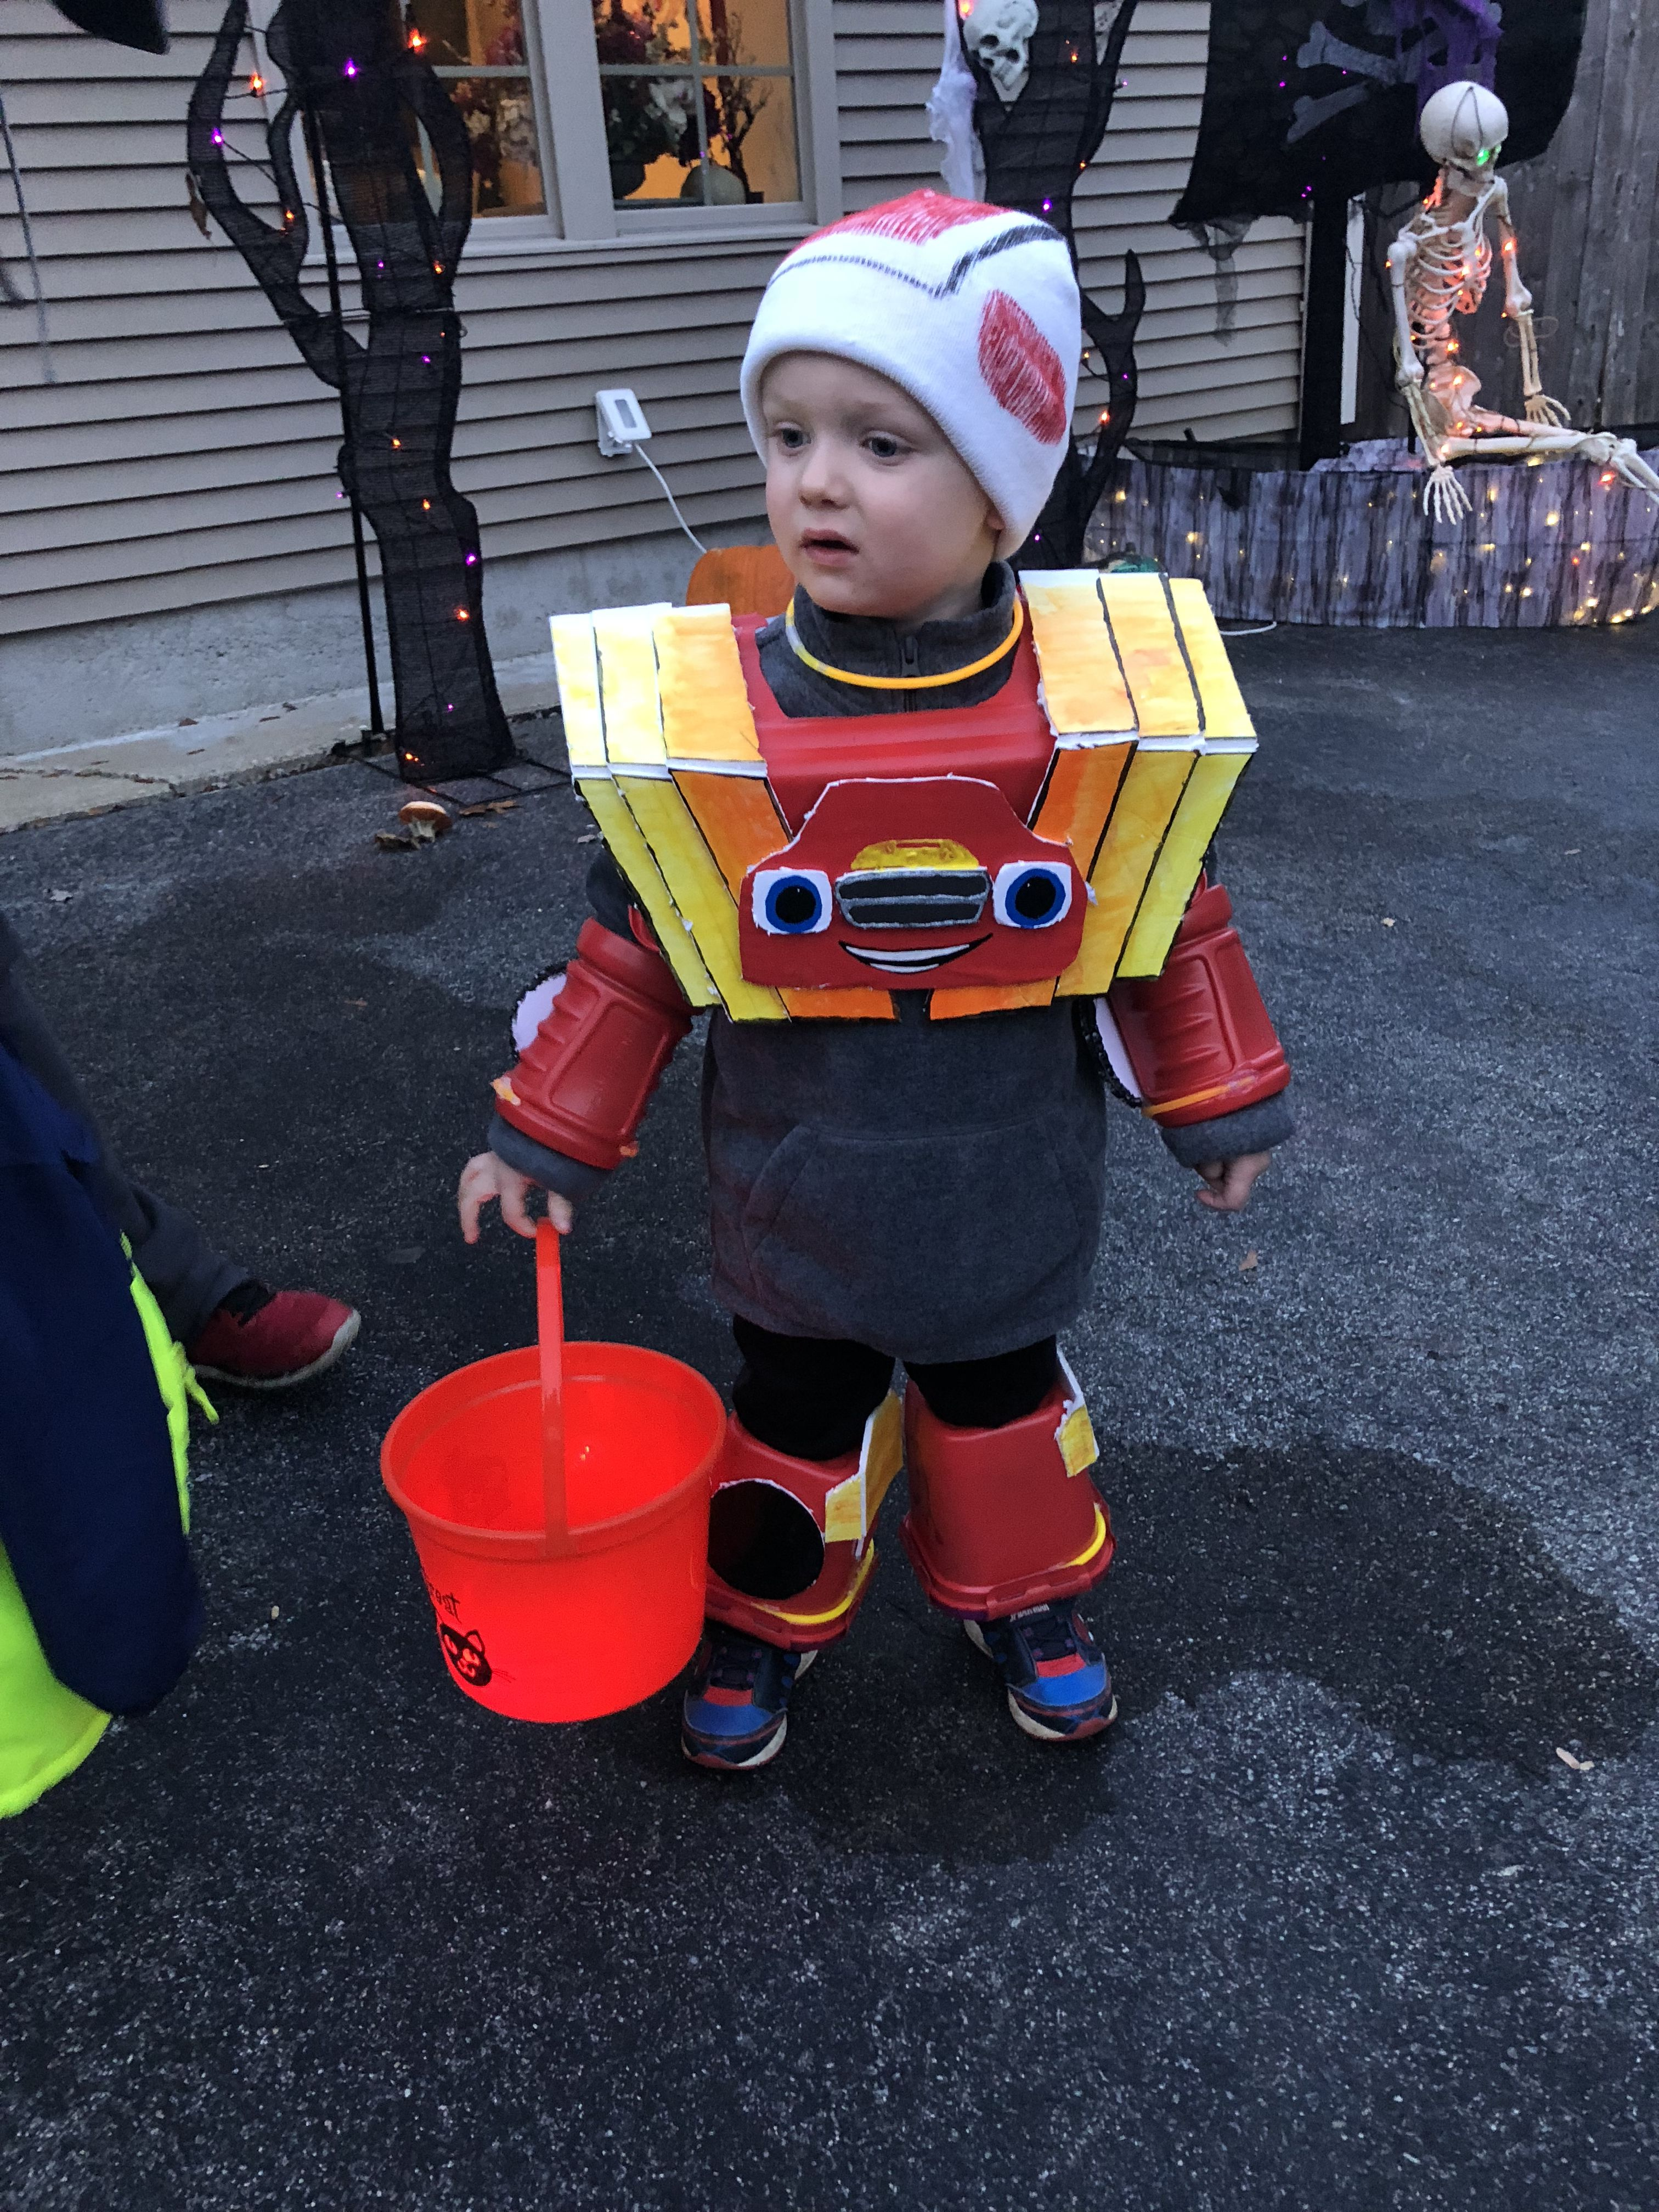 Homemade Robot Blaze costume from Blaze and the Monster